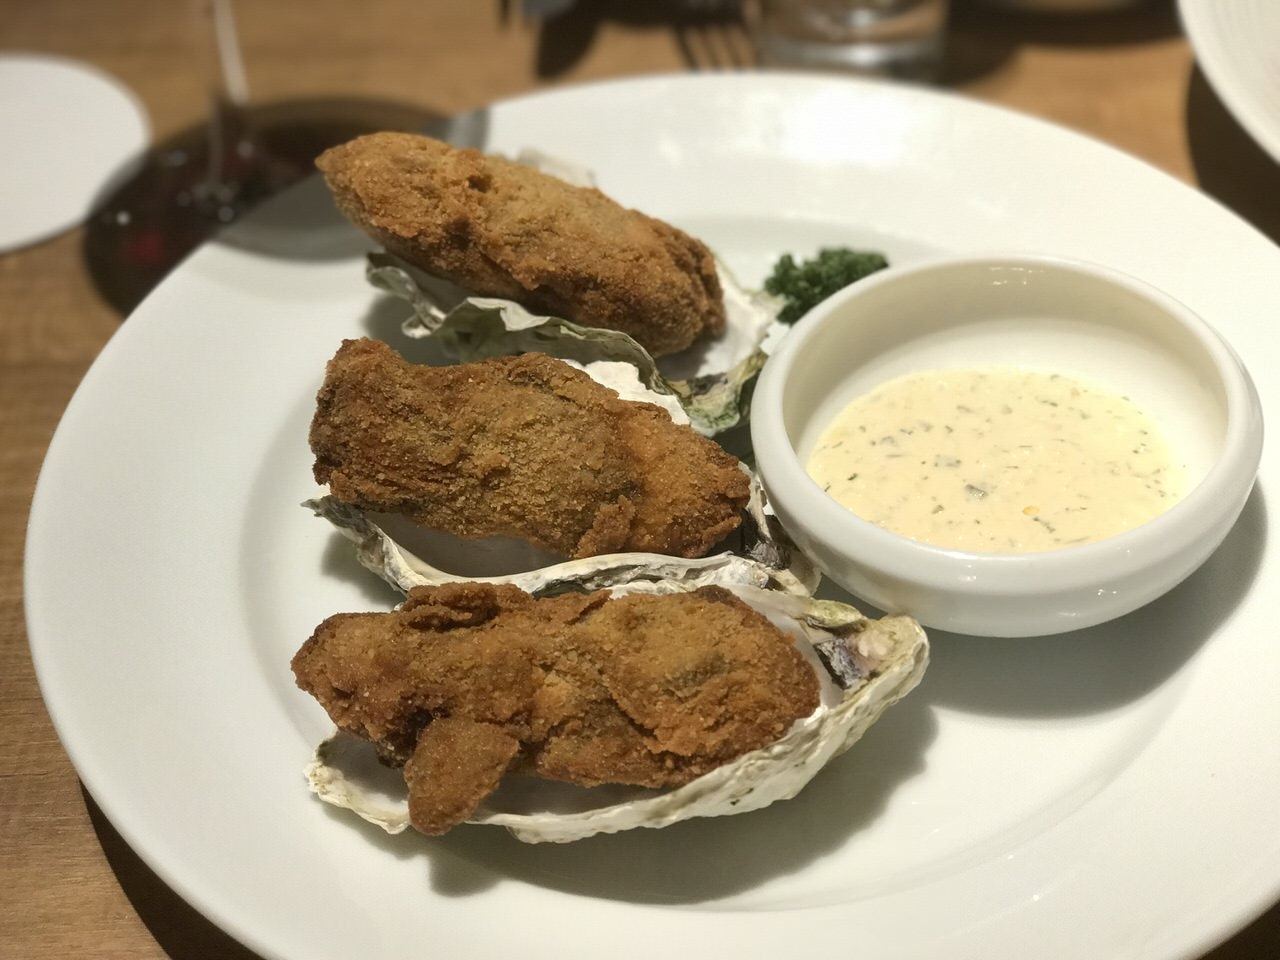 Shinjuku nishiguchi oyster bar 3260